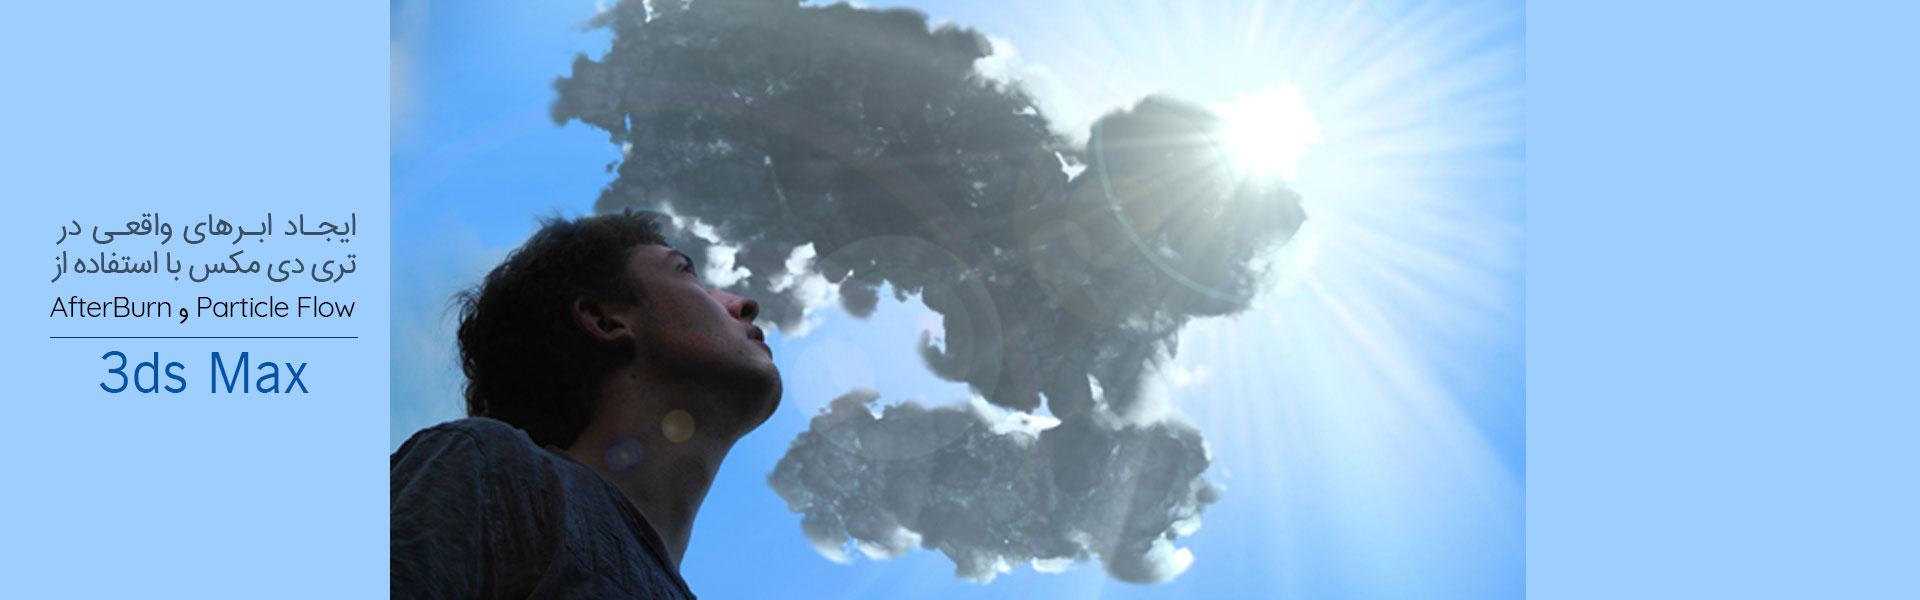 3dmax sakhtan abr - ایجاد ابرهای واقعی در تری دی مکس با استفاده از Particle Flow و AfterBurn